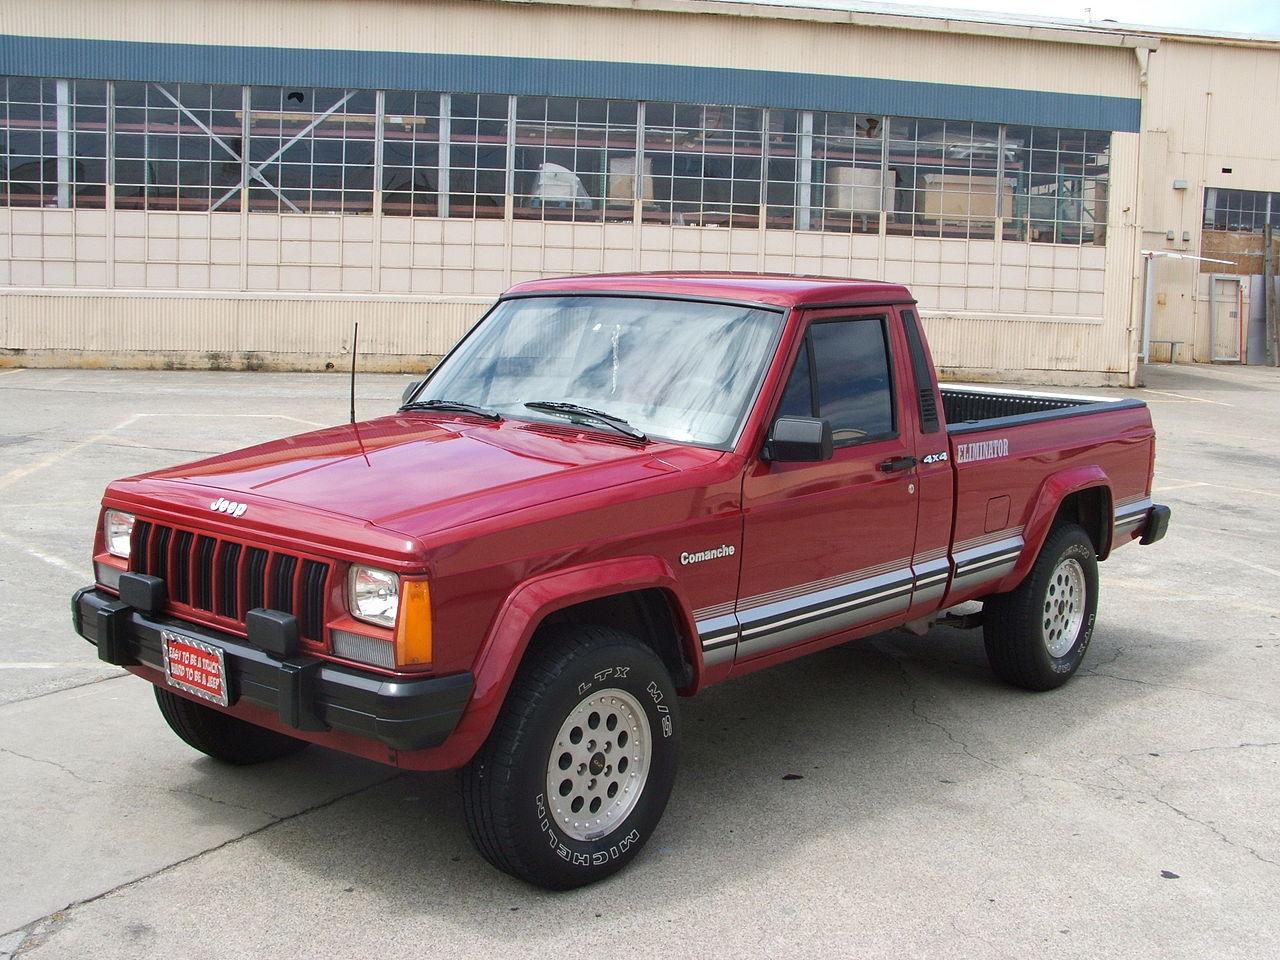 1280px-1990_Jeep_Comanche_Eliminator.jpg